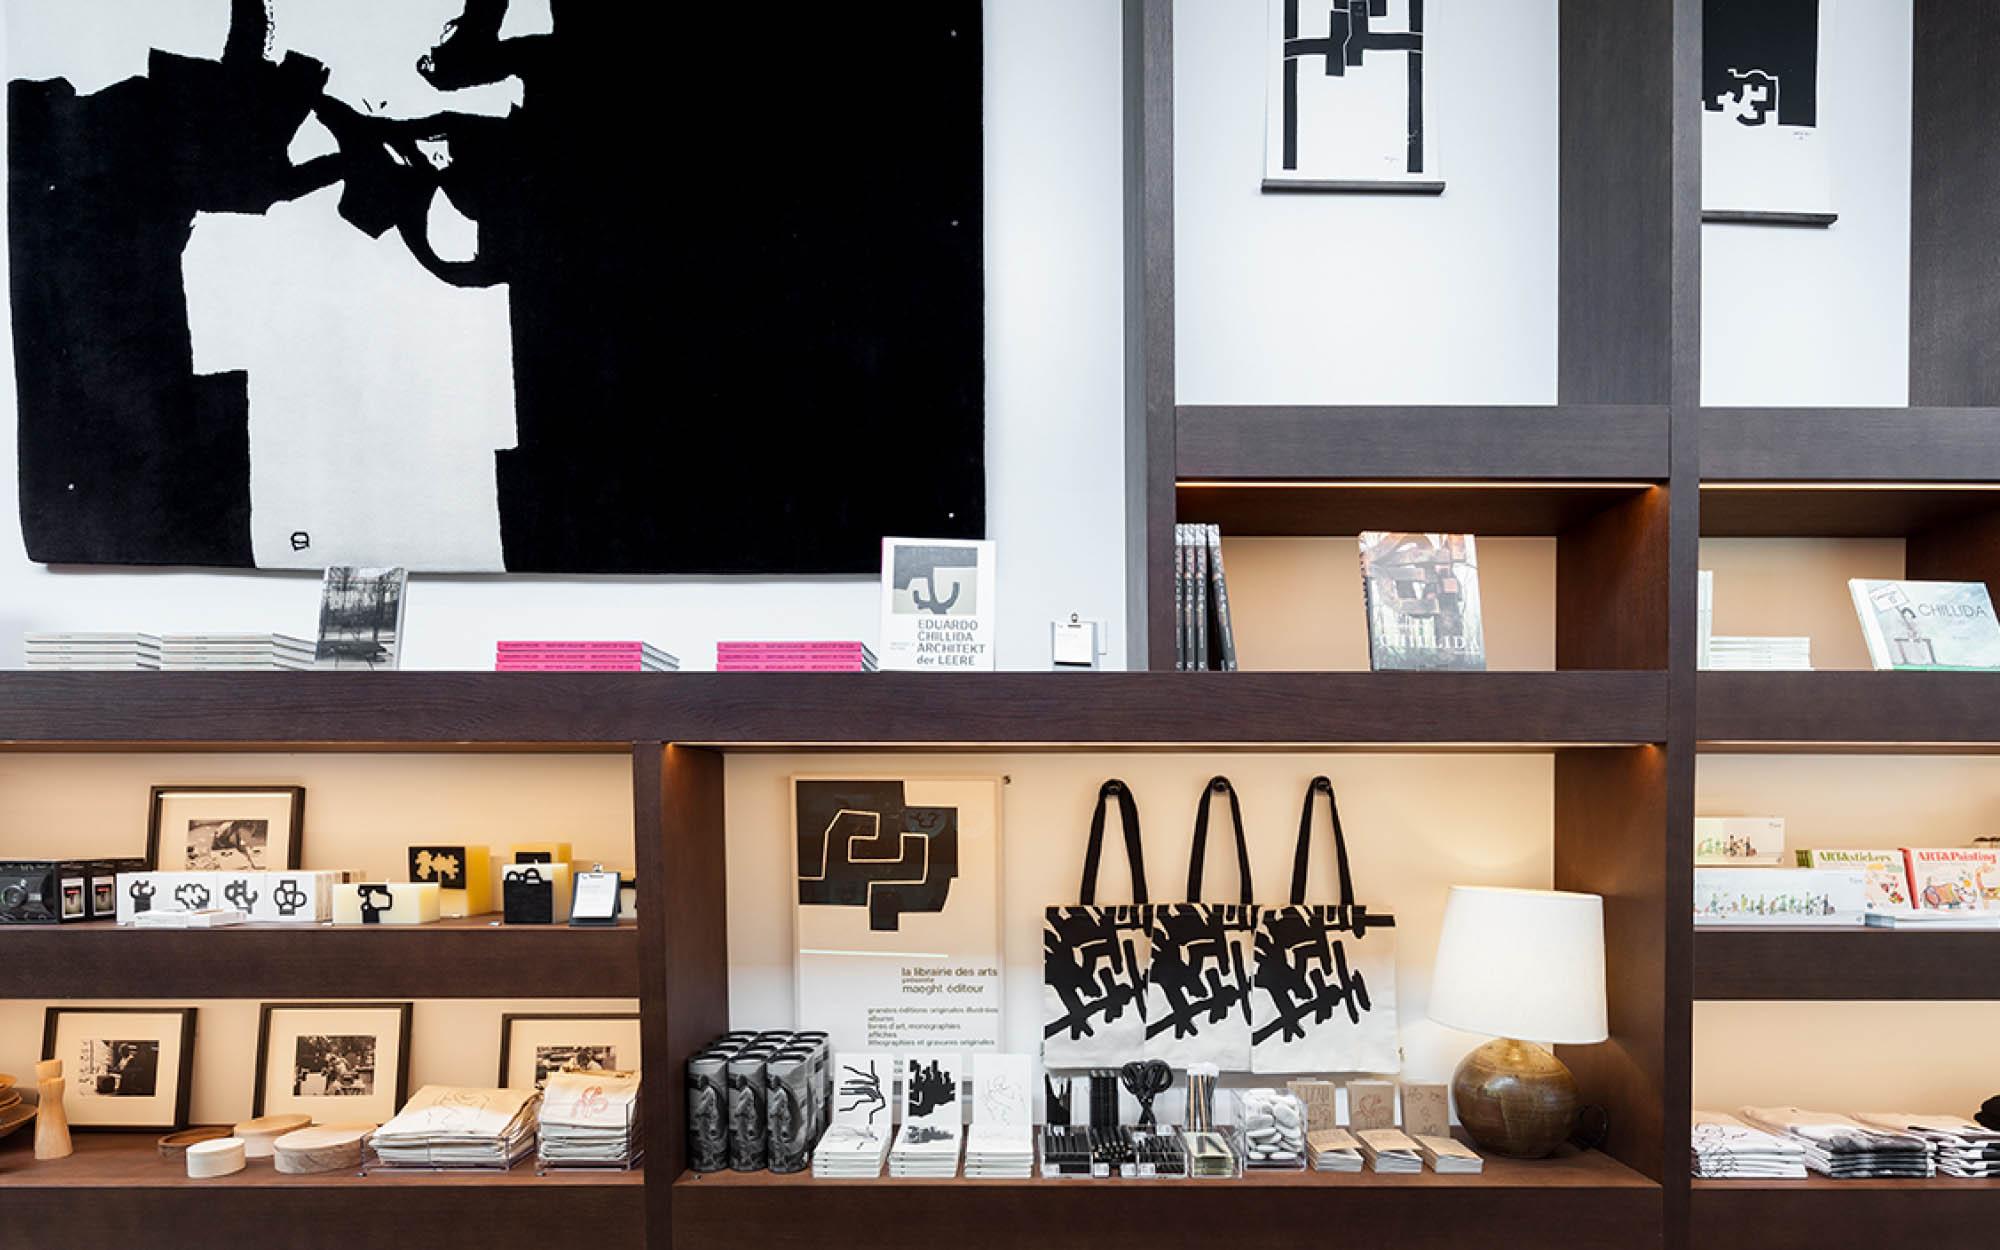 luis_laplace-Chillida_Museum_Shop-4